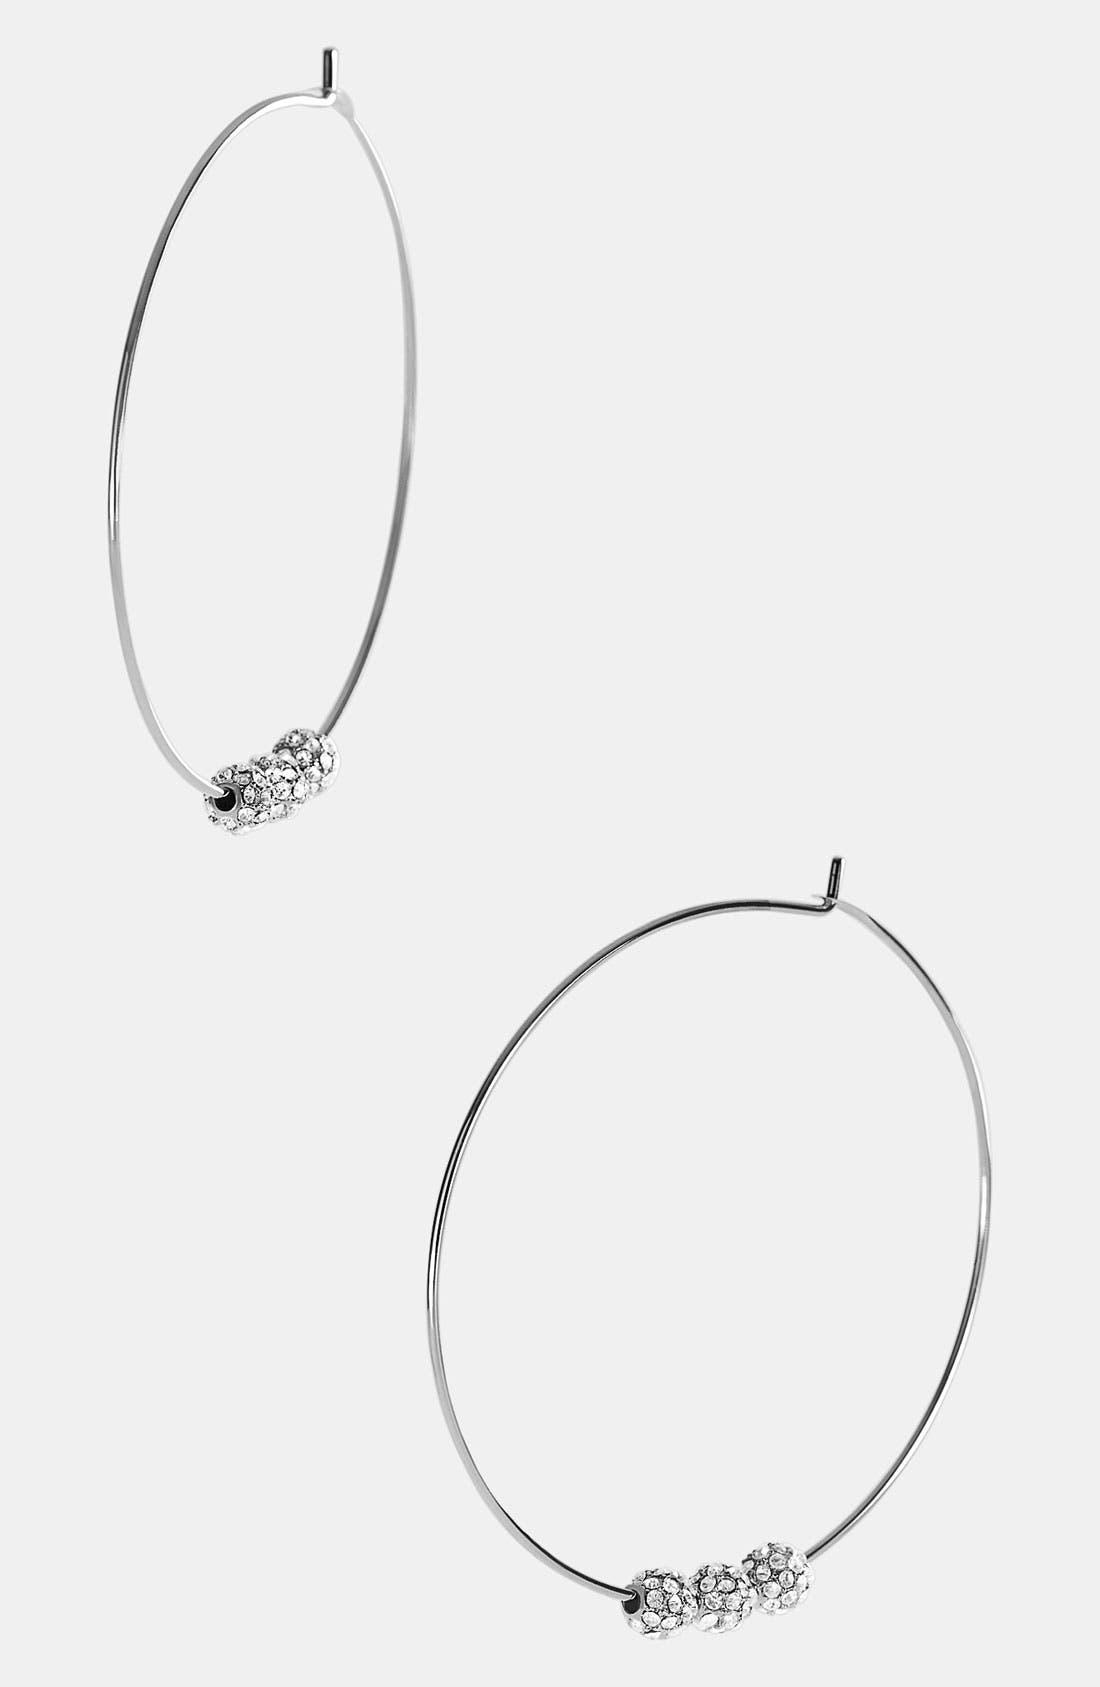 Main Image - Michael Kors 'Fireball Whisper' Large Hoop Earrings